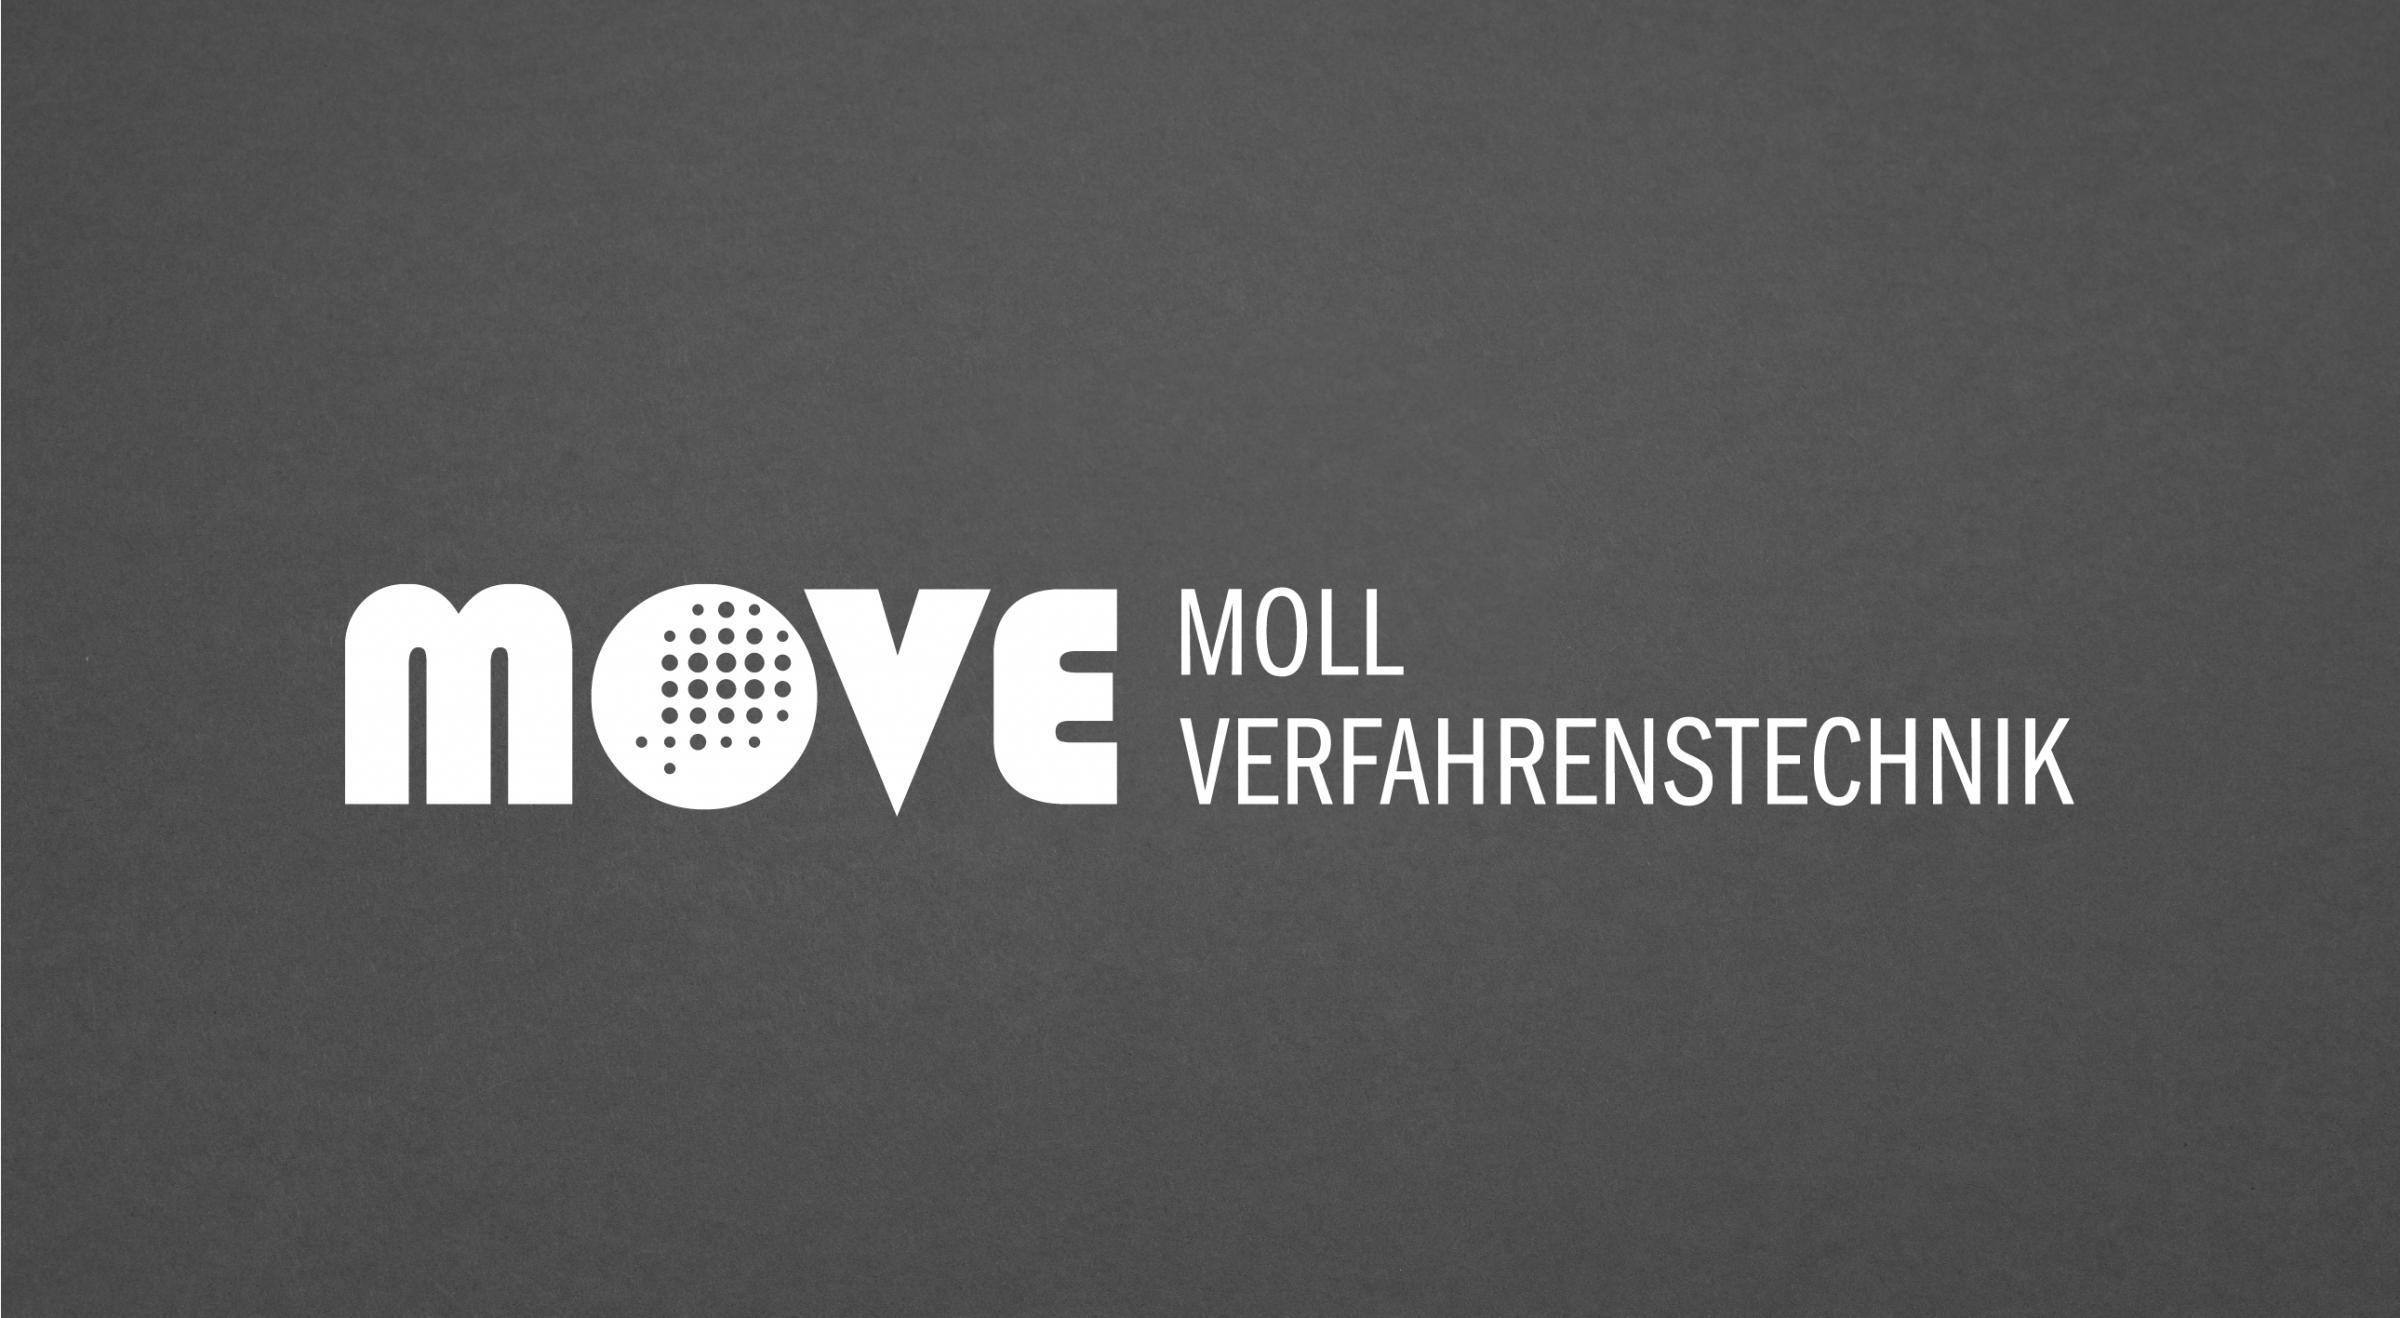 Moll Verfahrenstechnik Logogestaltung horizontale Anordnung